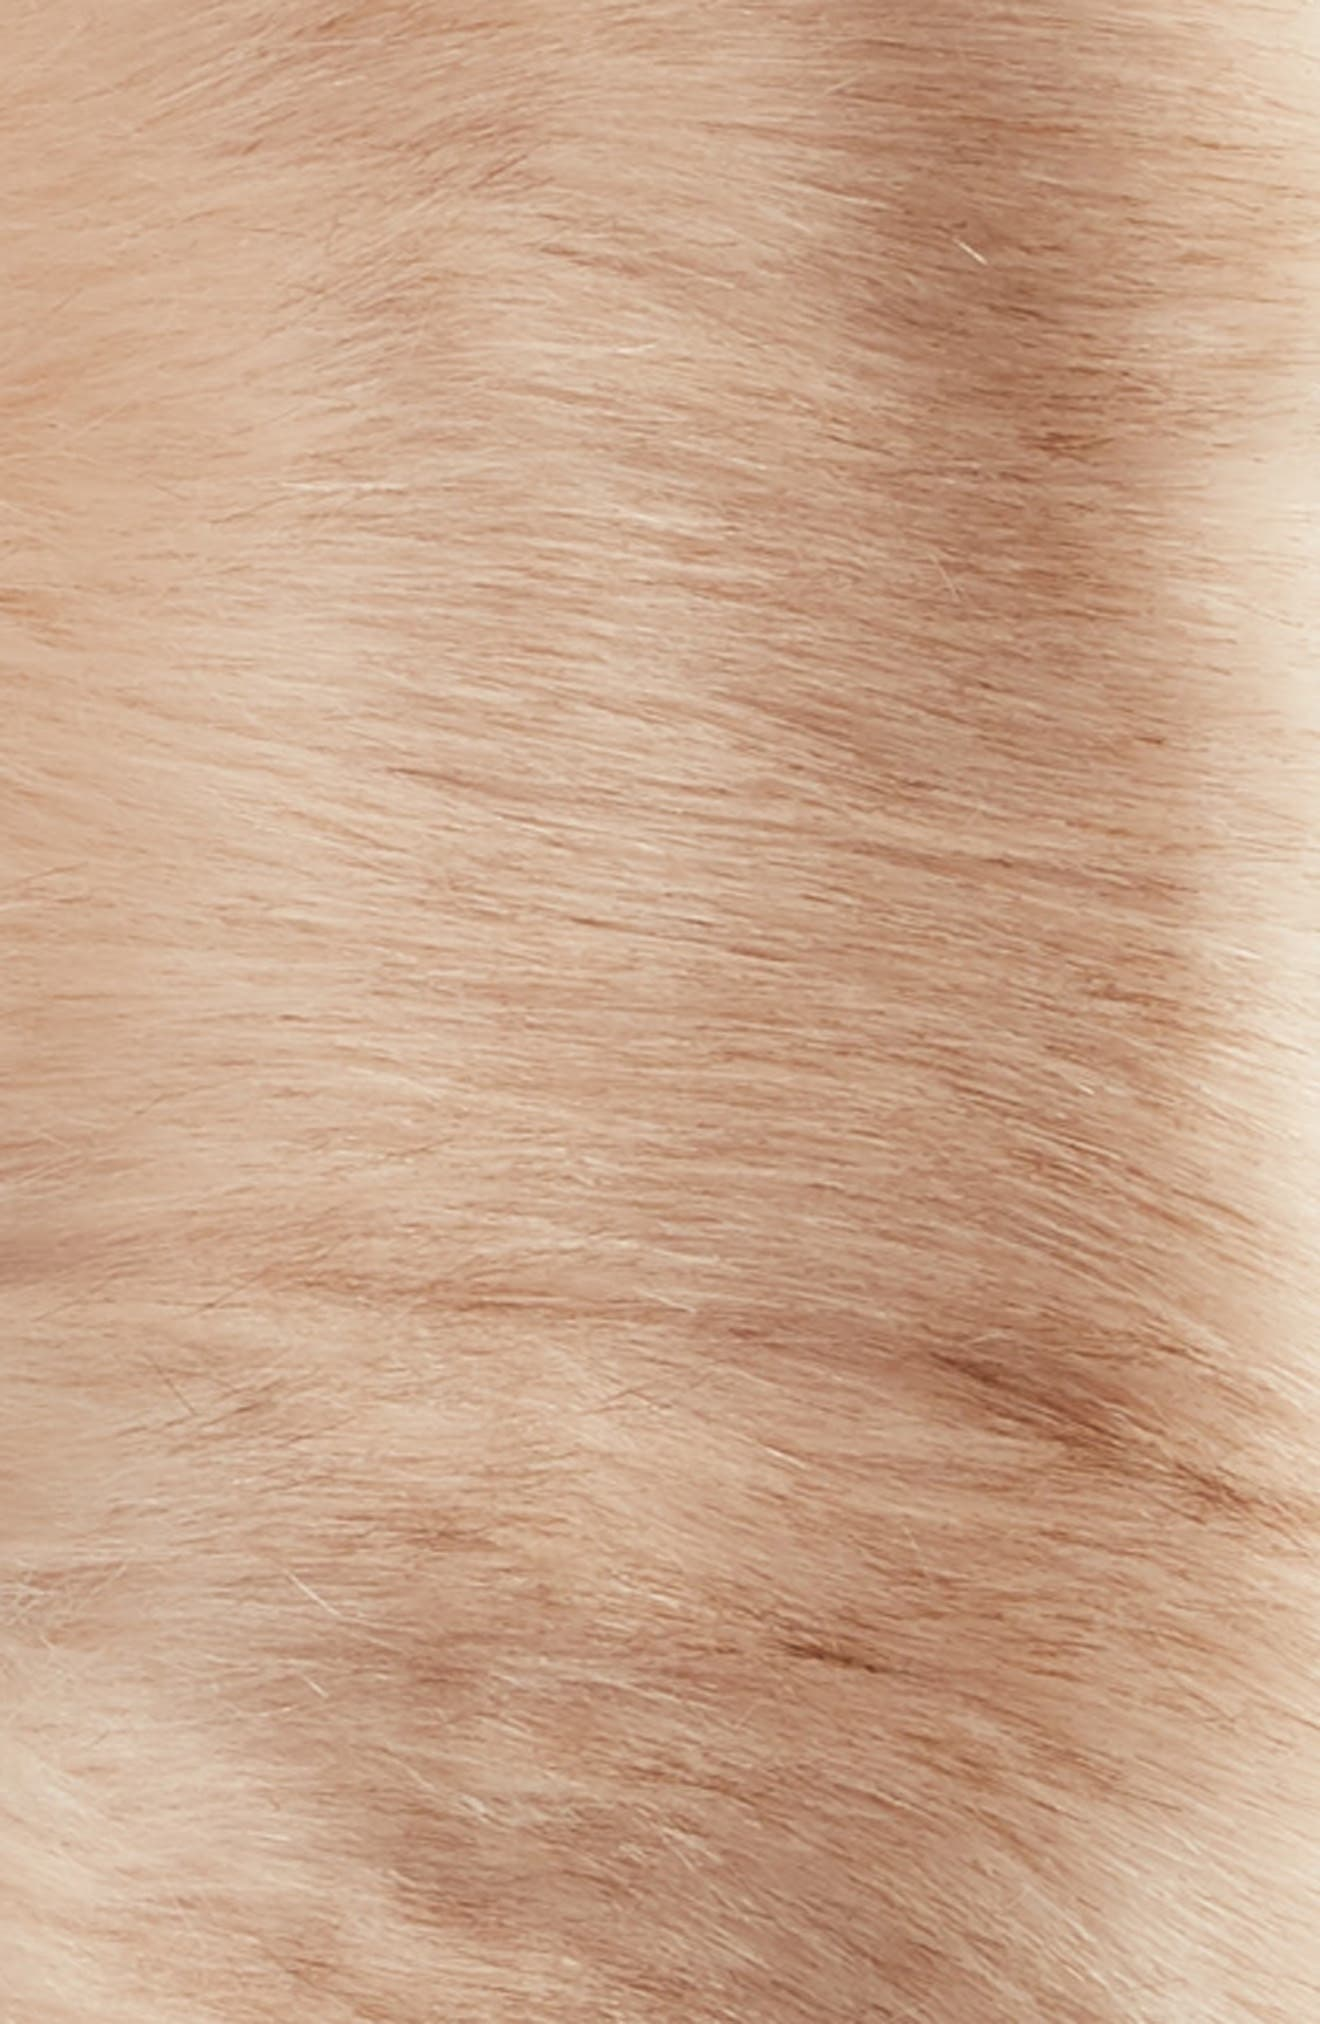 SOLE SOCIETY, Faux Fur Stole, Alternate thumbnail 4, color, BLUSH